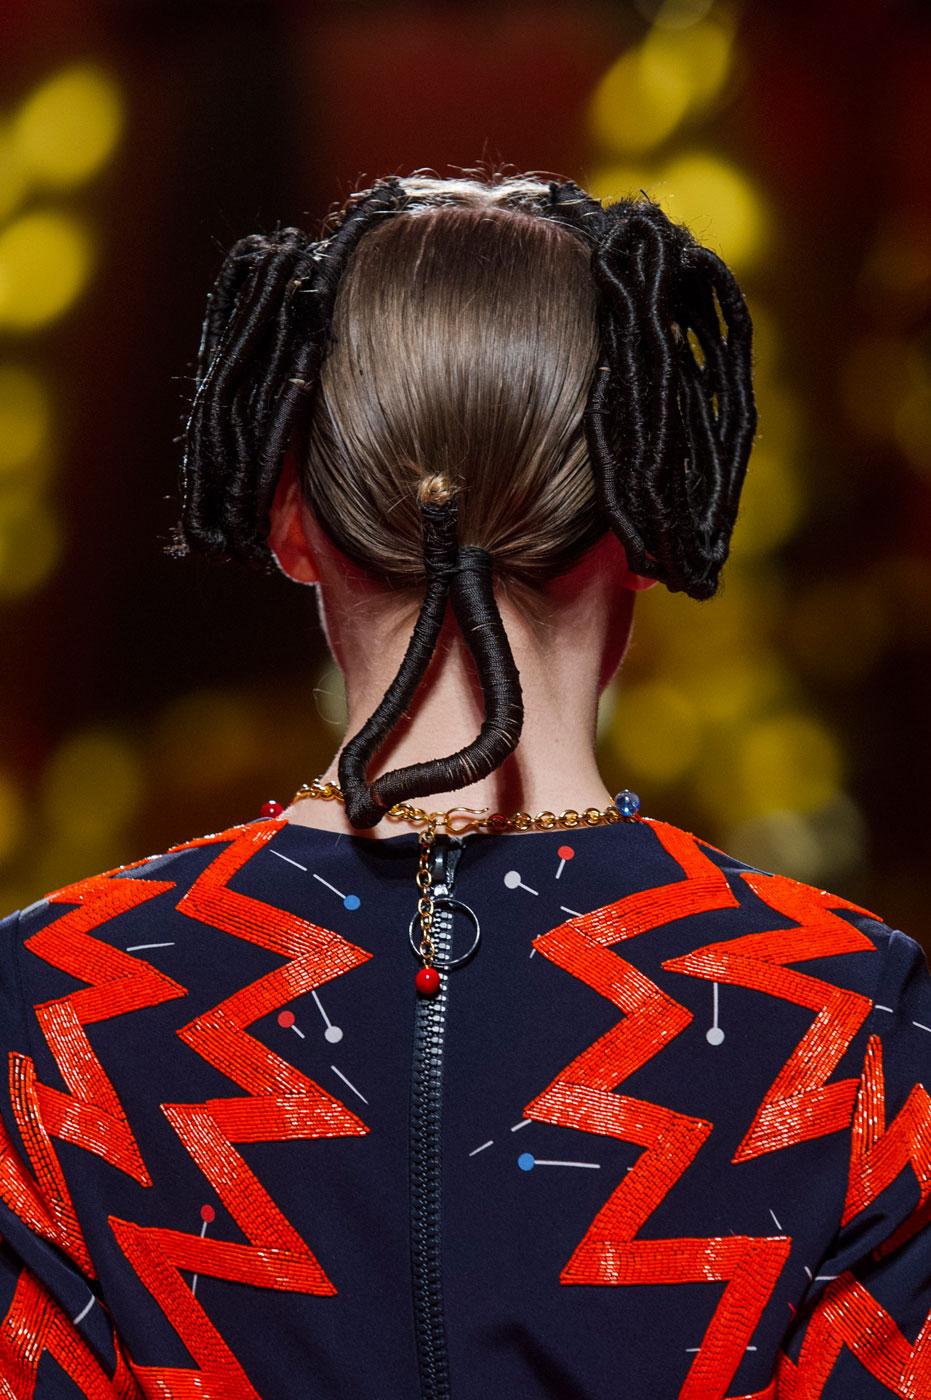 Schiaparelli-fashion-runway-show-close-ups-haute-couture-paris-spring-summer-2015-the-impression-56